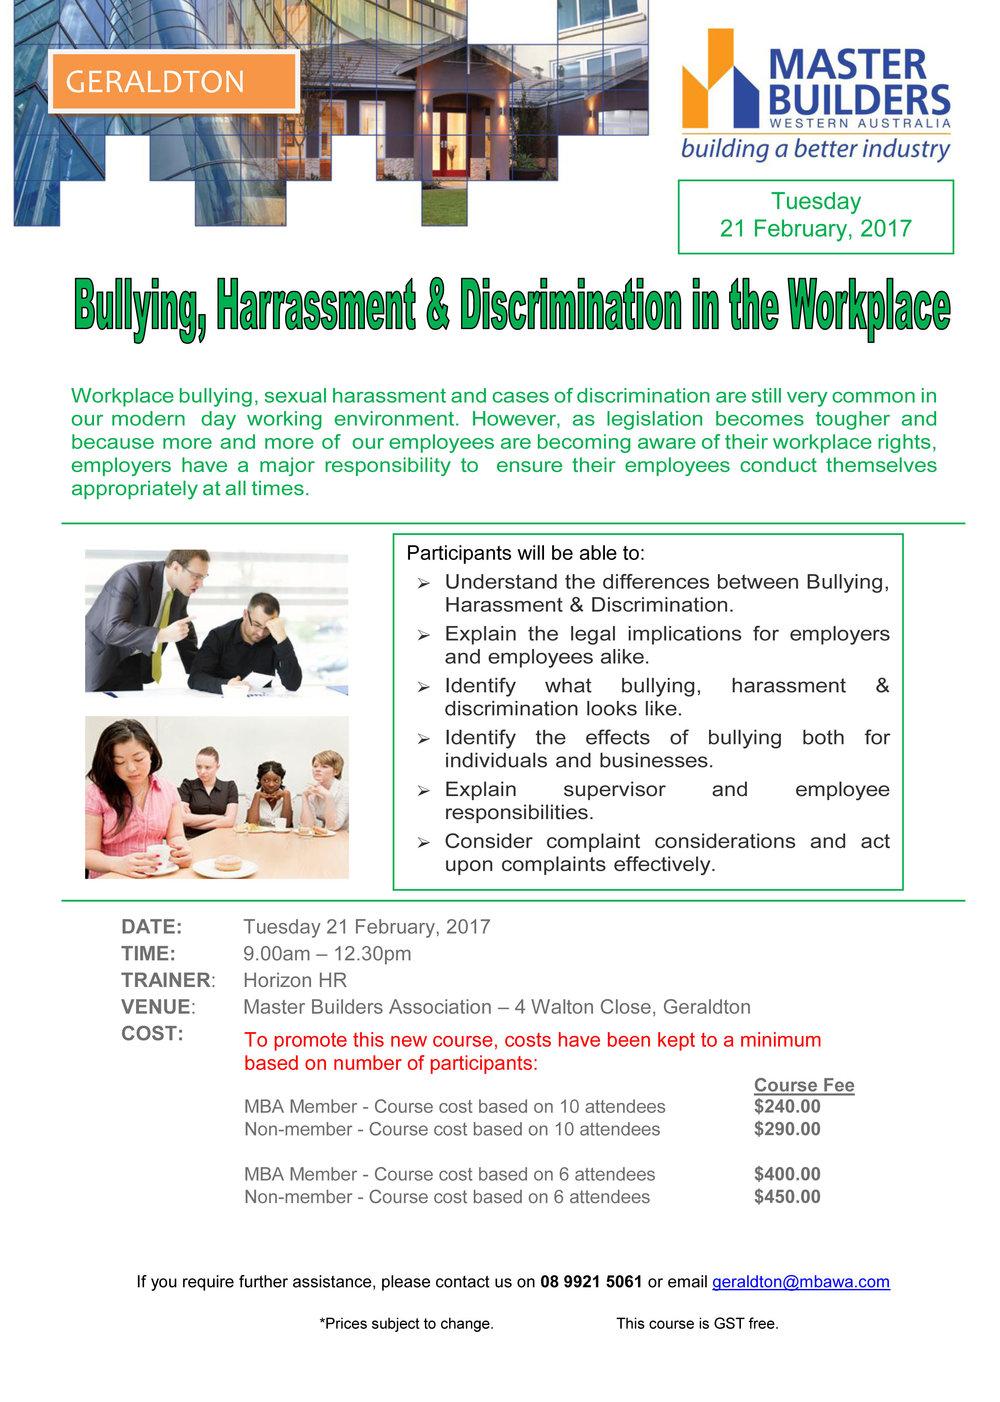 17967424_Bullying Harrassment  Discrimination in the Workplace - 21 Feb - rev1-1.jpg